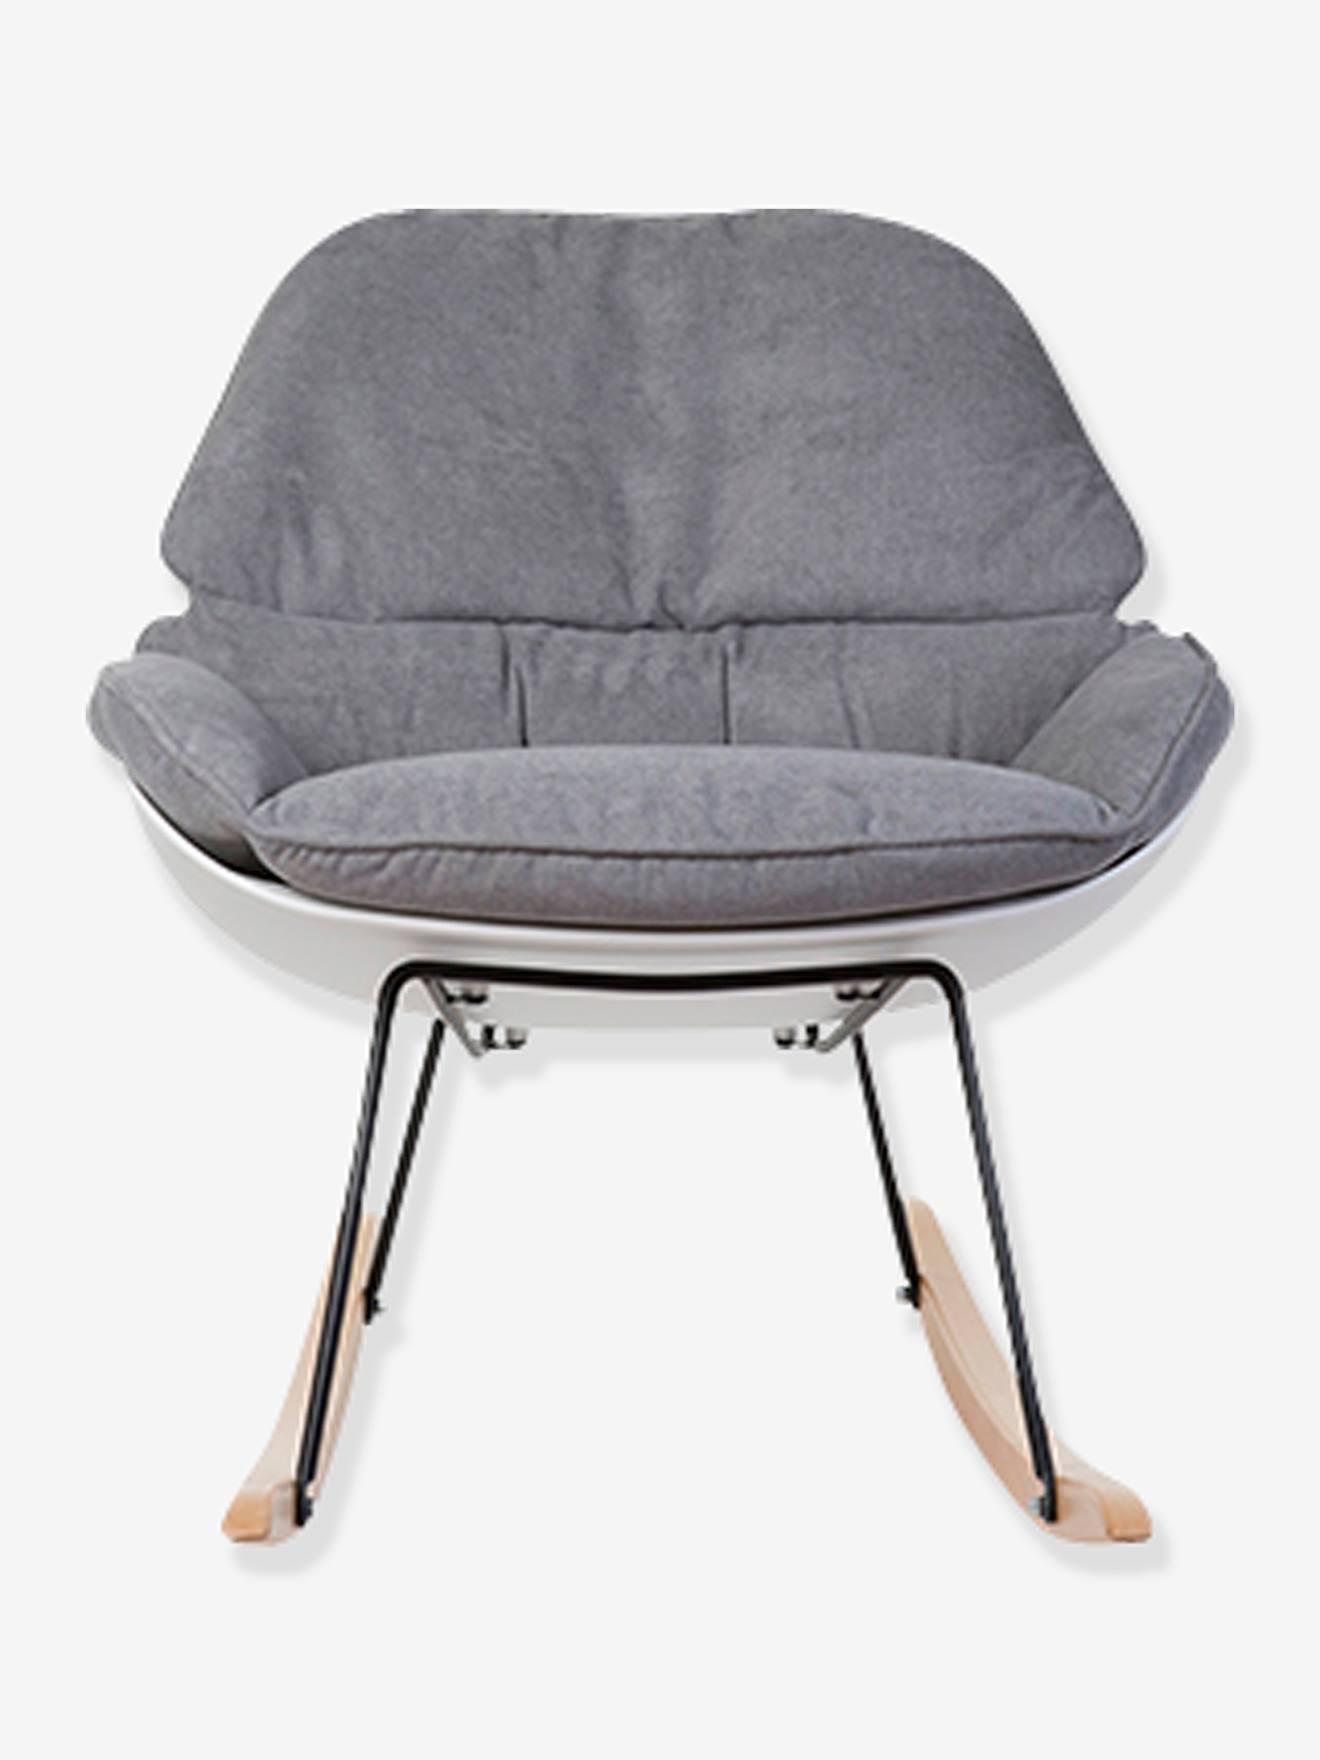 fauteuil a bascule childhome rocking chaise lounge blanc gris